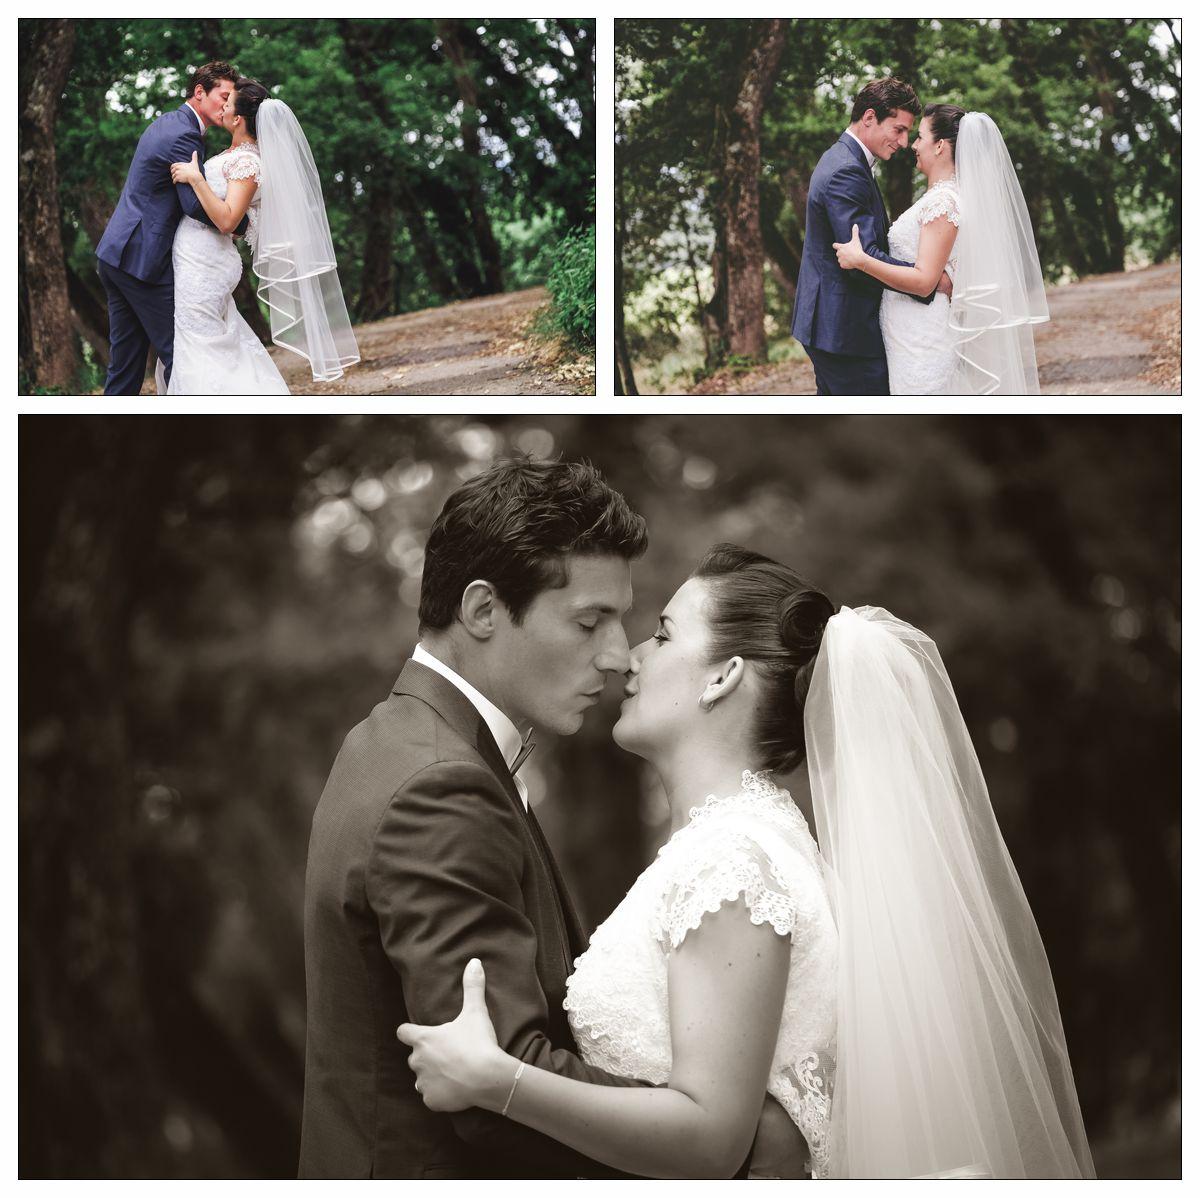 photographe mariage st raphaël